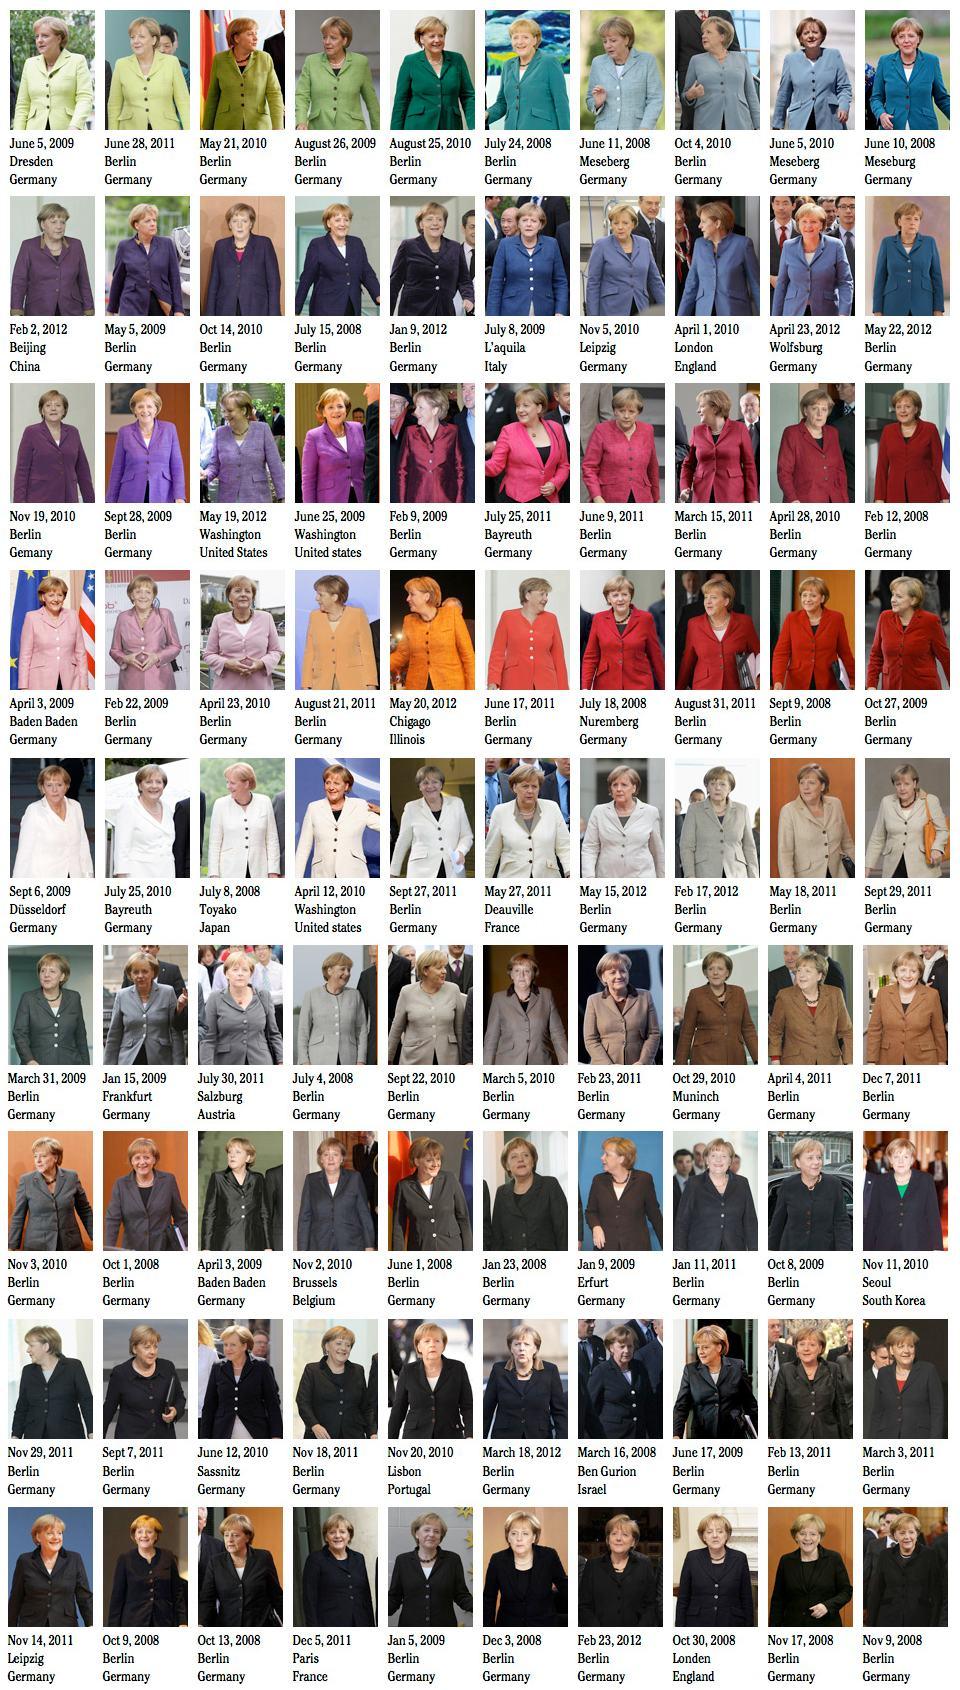 Angela-Merkel-Pantone-Farbskala-von-Noortje-van-Eekelen